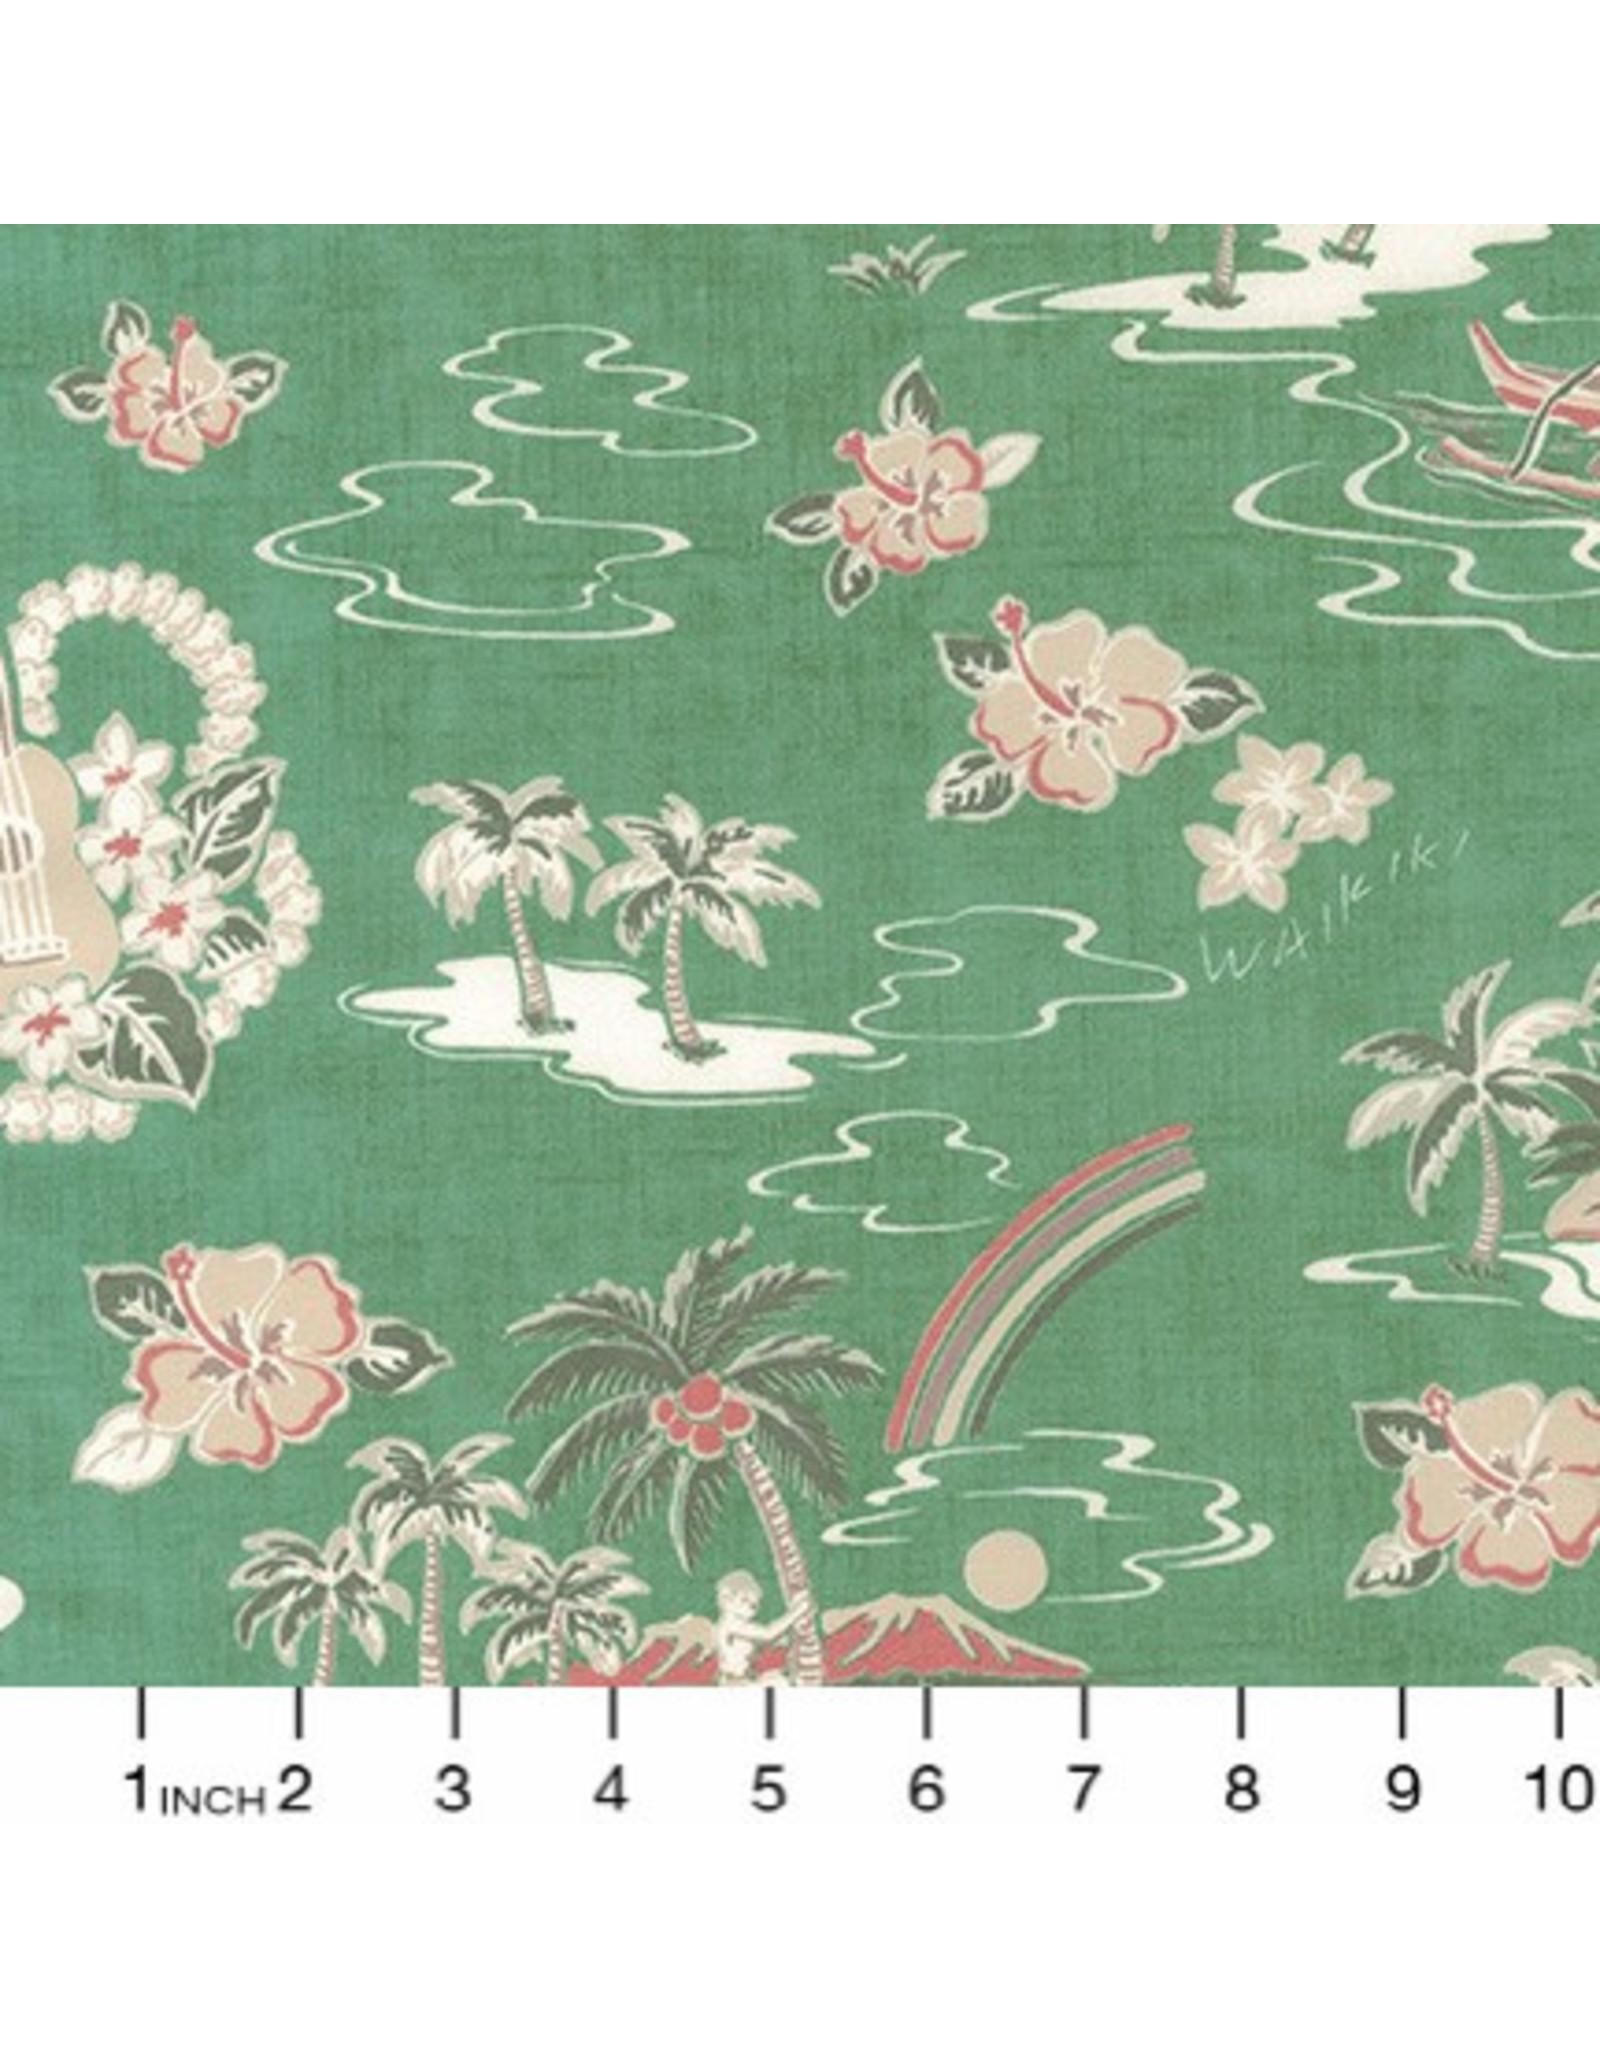 Sevenberry Rayon Lawn, Ecovero Aloha Prints, Hawaii in Tropical, Fabric Half-Yards